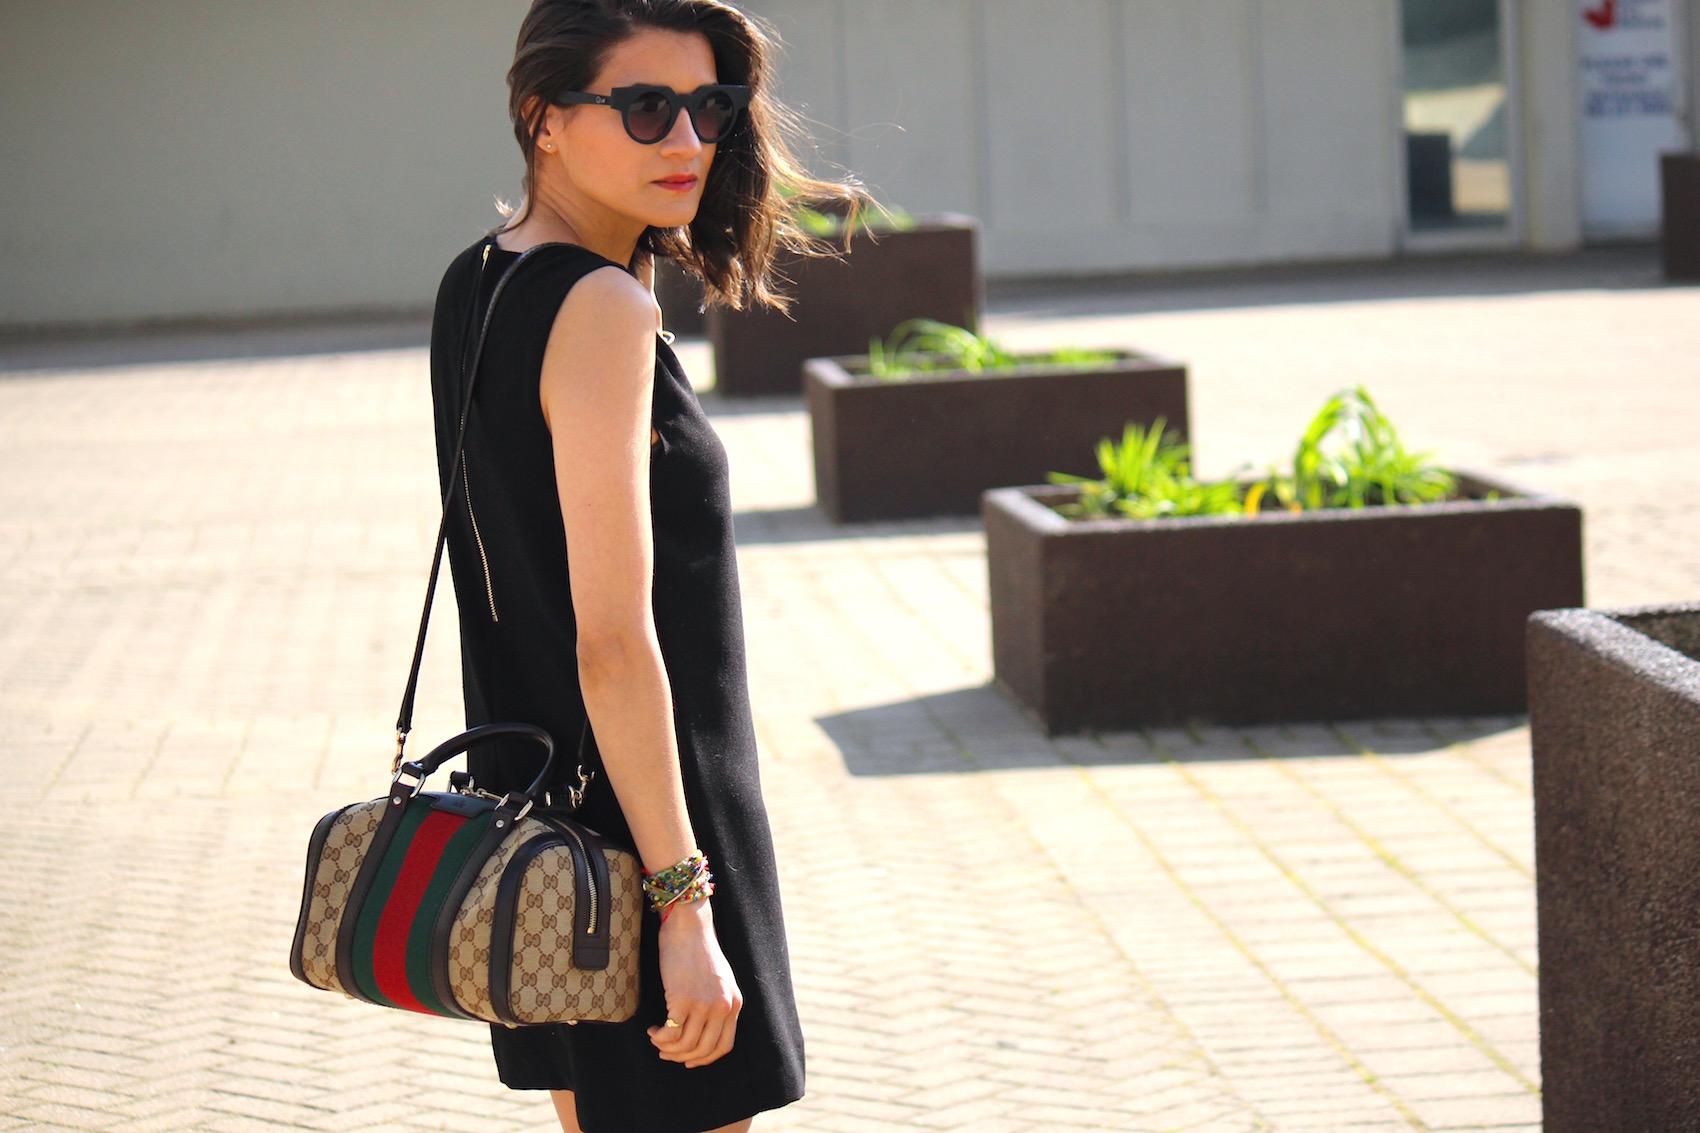 WoahStyle.com | How to Wear Black in the Summer_Black Mini Dress_Zara Gladiator Sandals_Gucci Boston Bag with Heritage Stripes_Street_Style_2898.jpg